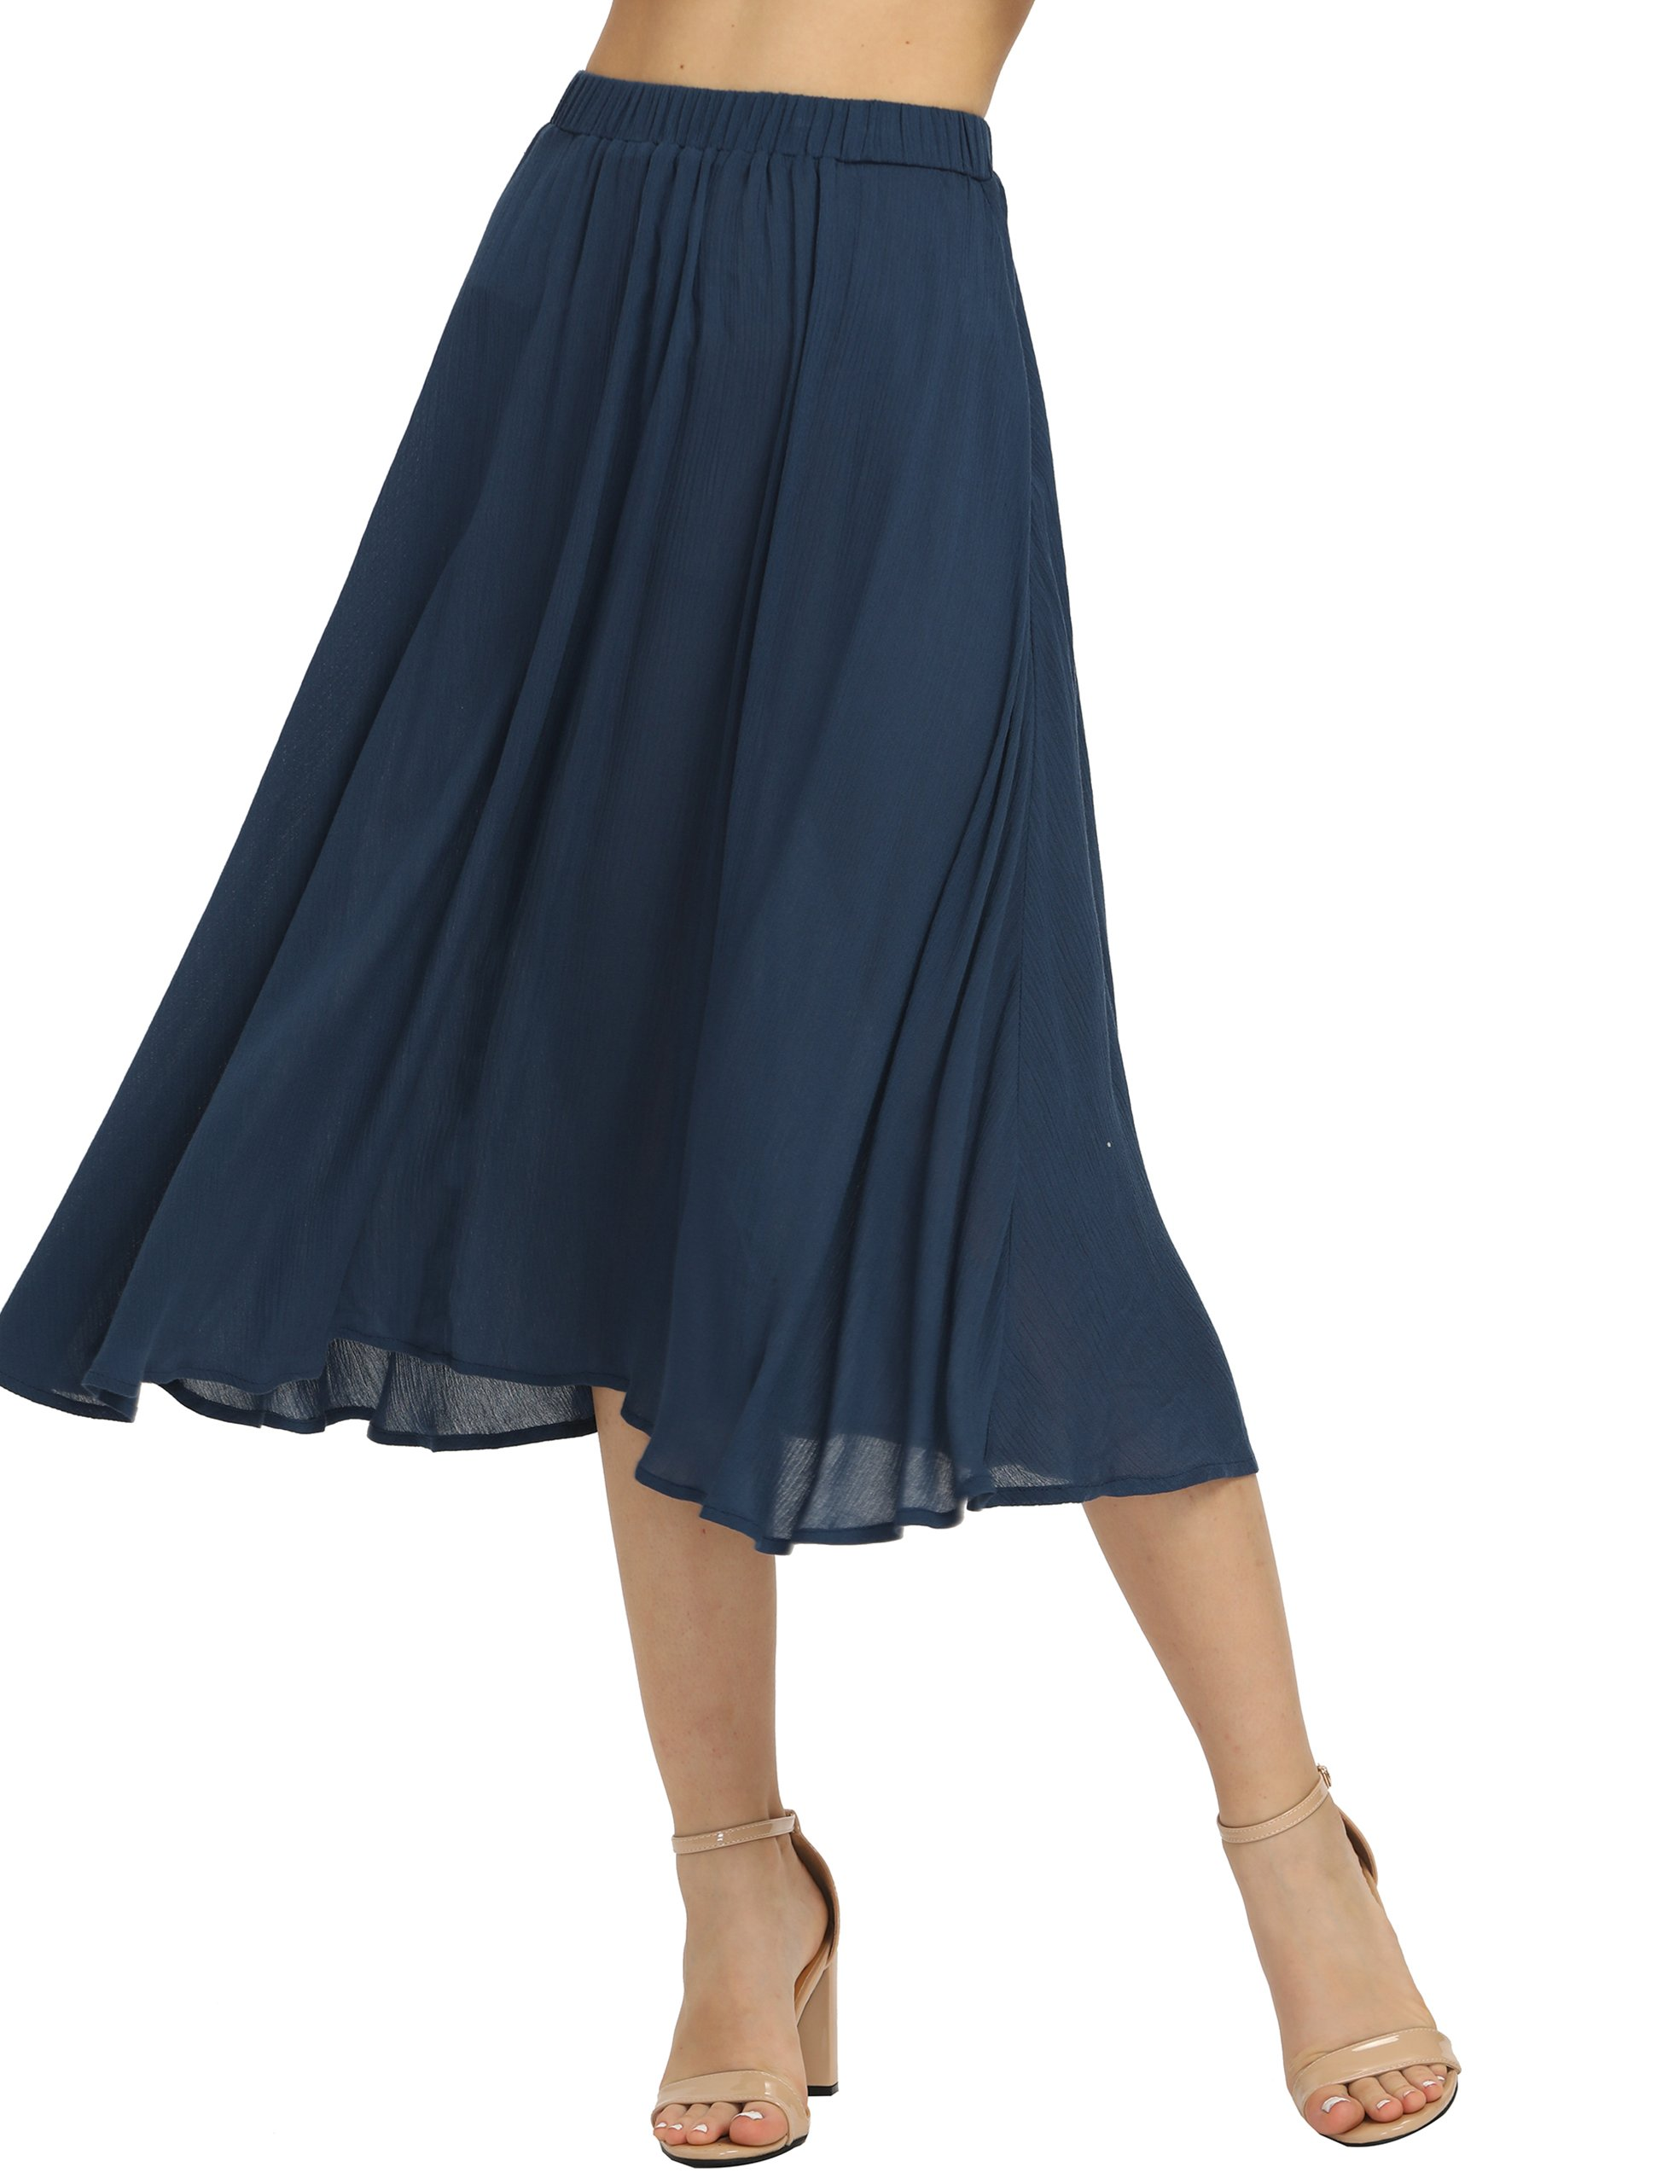 Romwe Women's Cotton Casual Summer Swing Long Midi Skirt Navy S